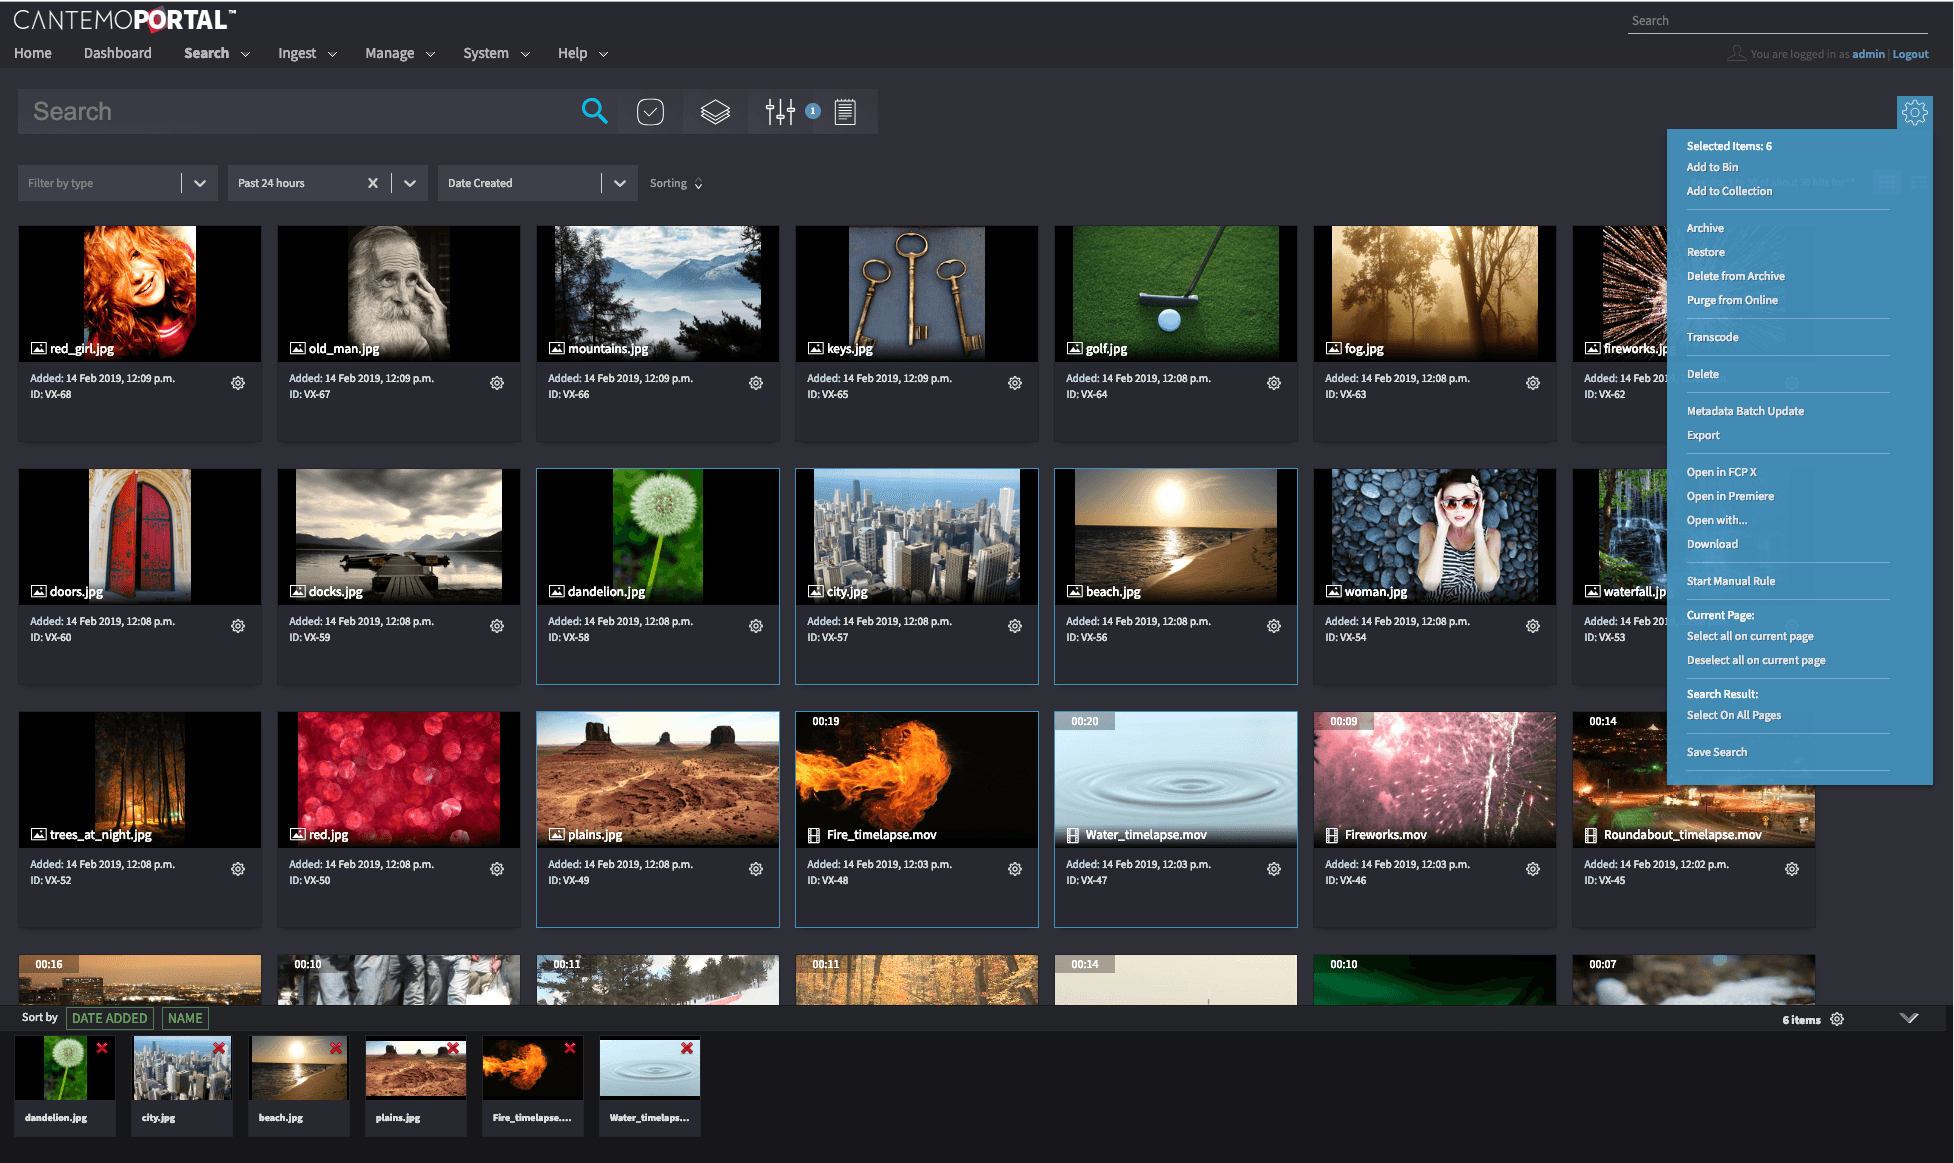 Portal 4 user interface